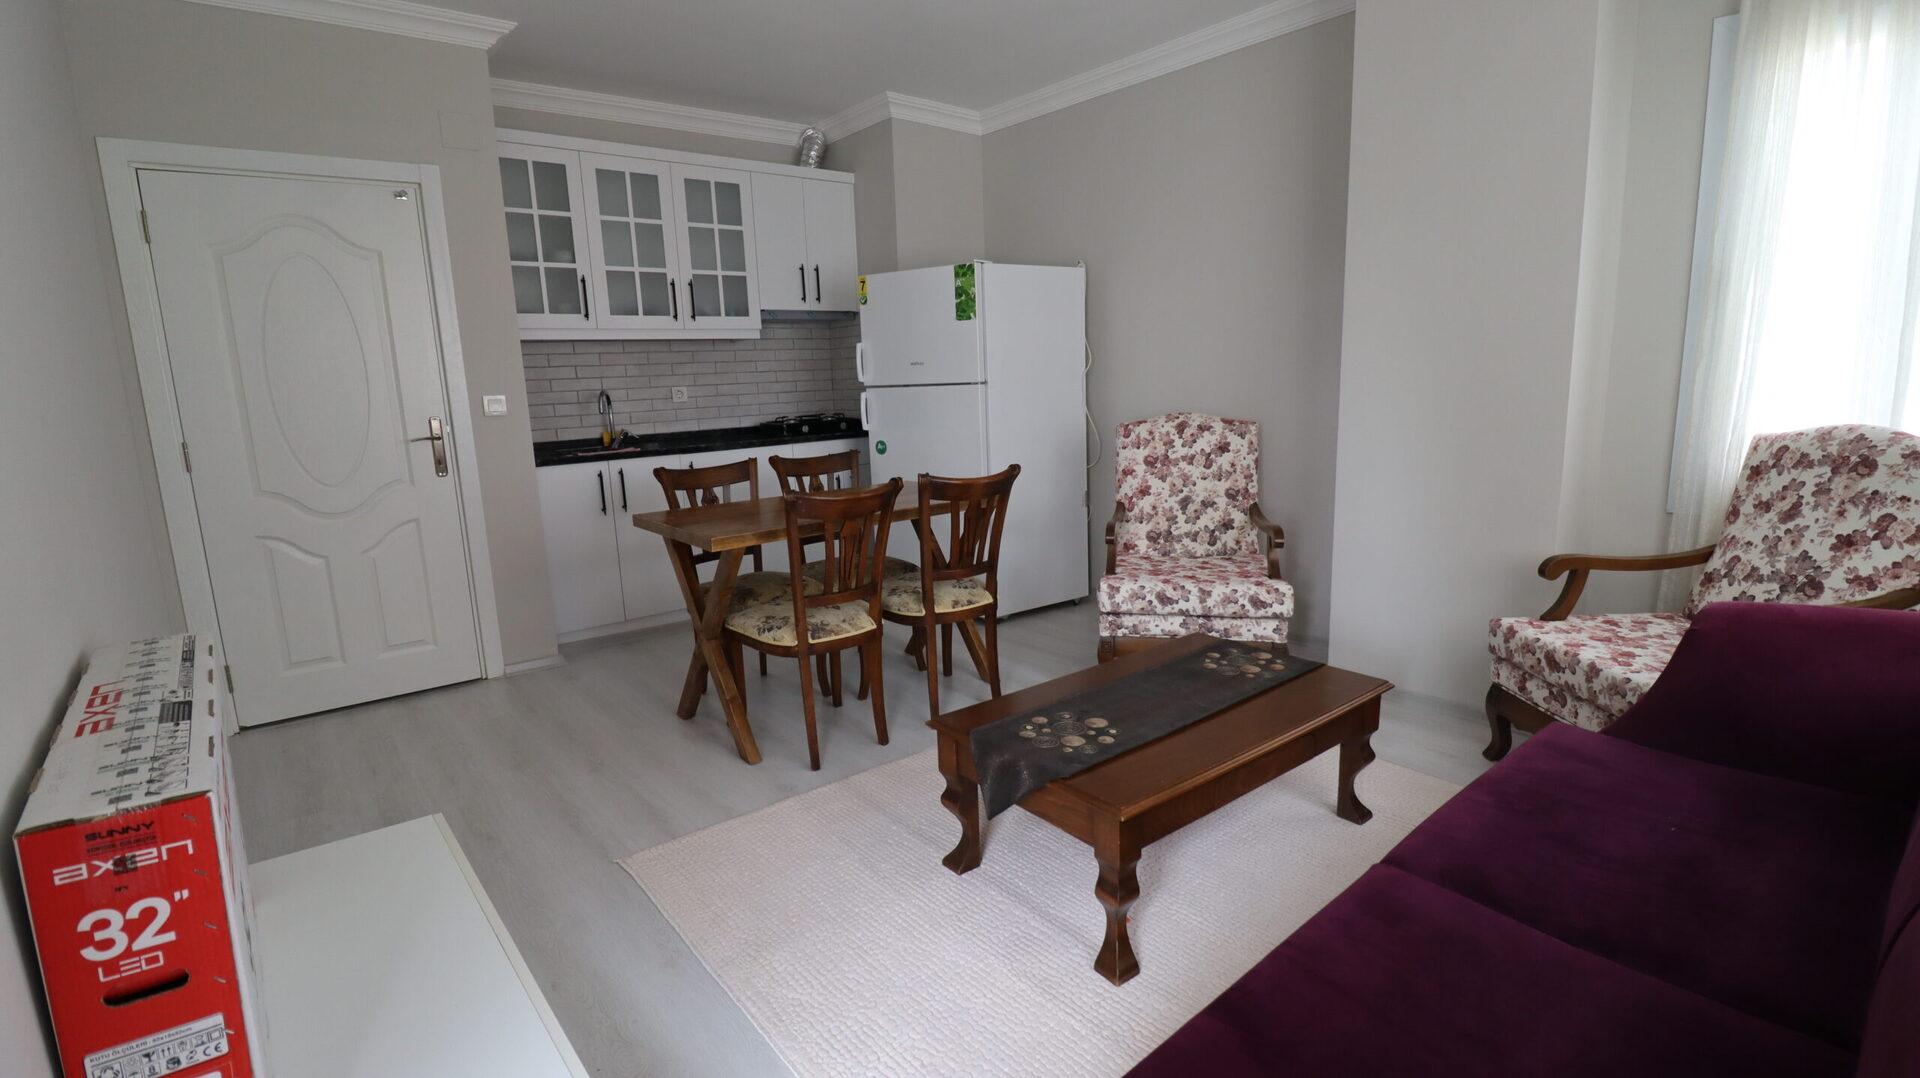 1 + 1 Furnished Apartment For Sale Near Mersin Erdemli Alata University